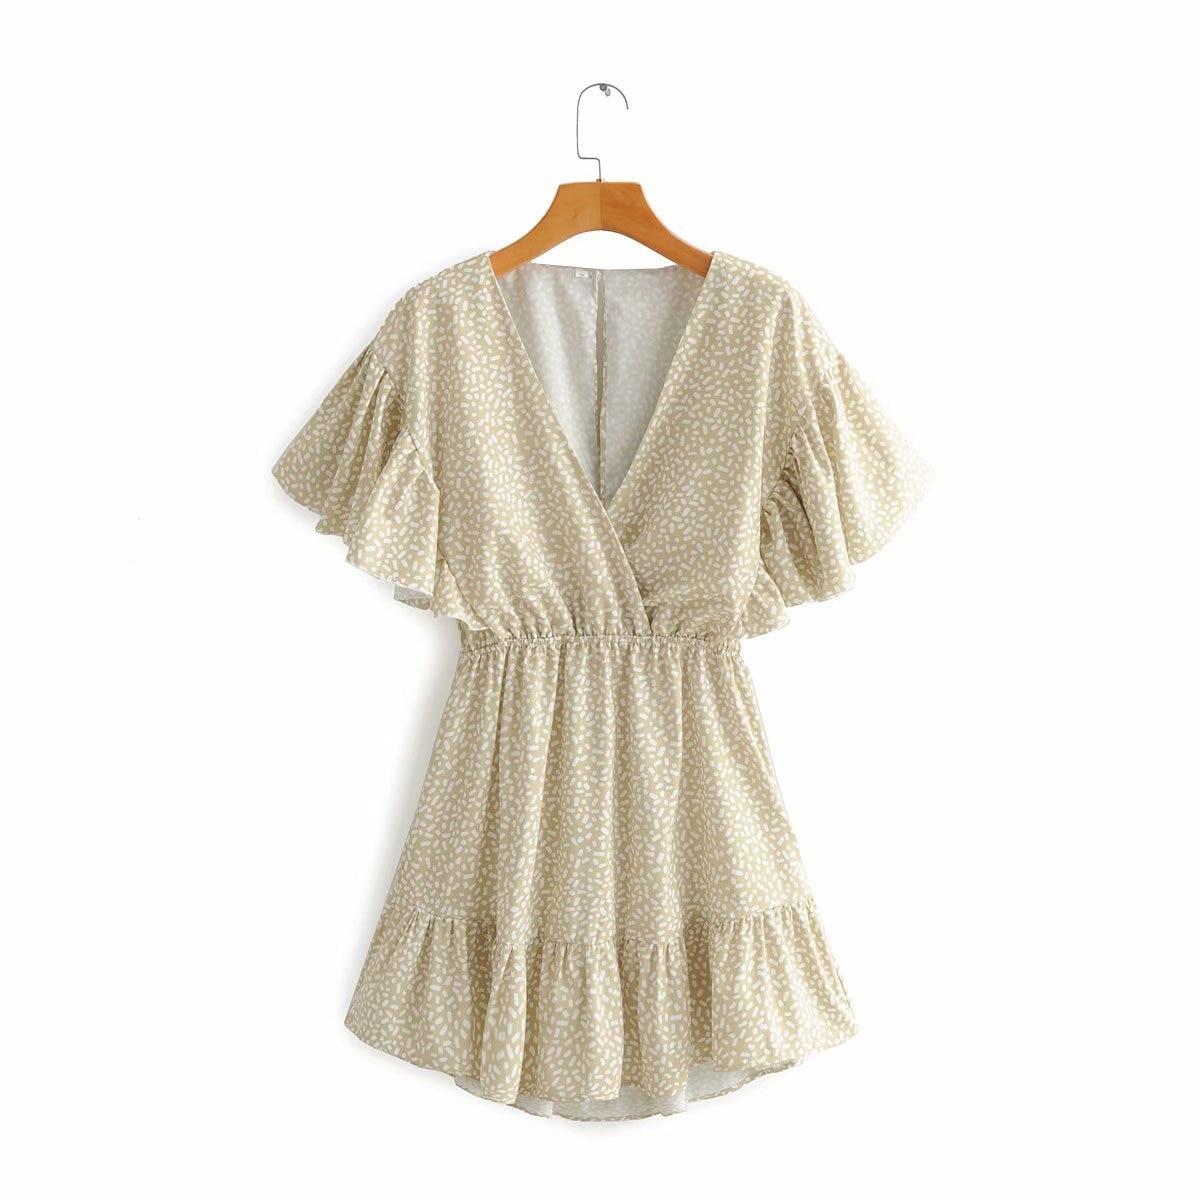 2020 New Spring Summer European Printed Female Dress Zaraing Vadiming Sheining WOMEN'S Printed Dress Streetwear S501